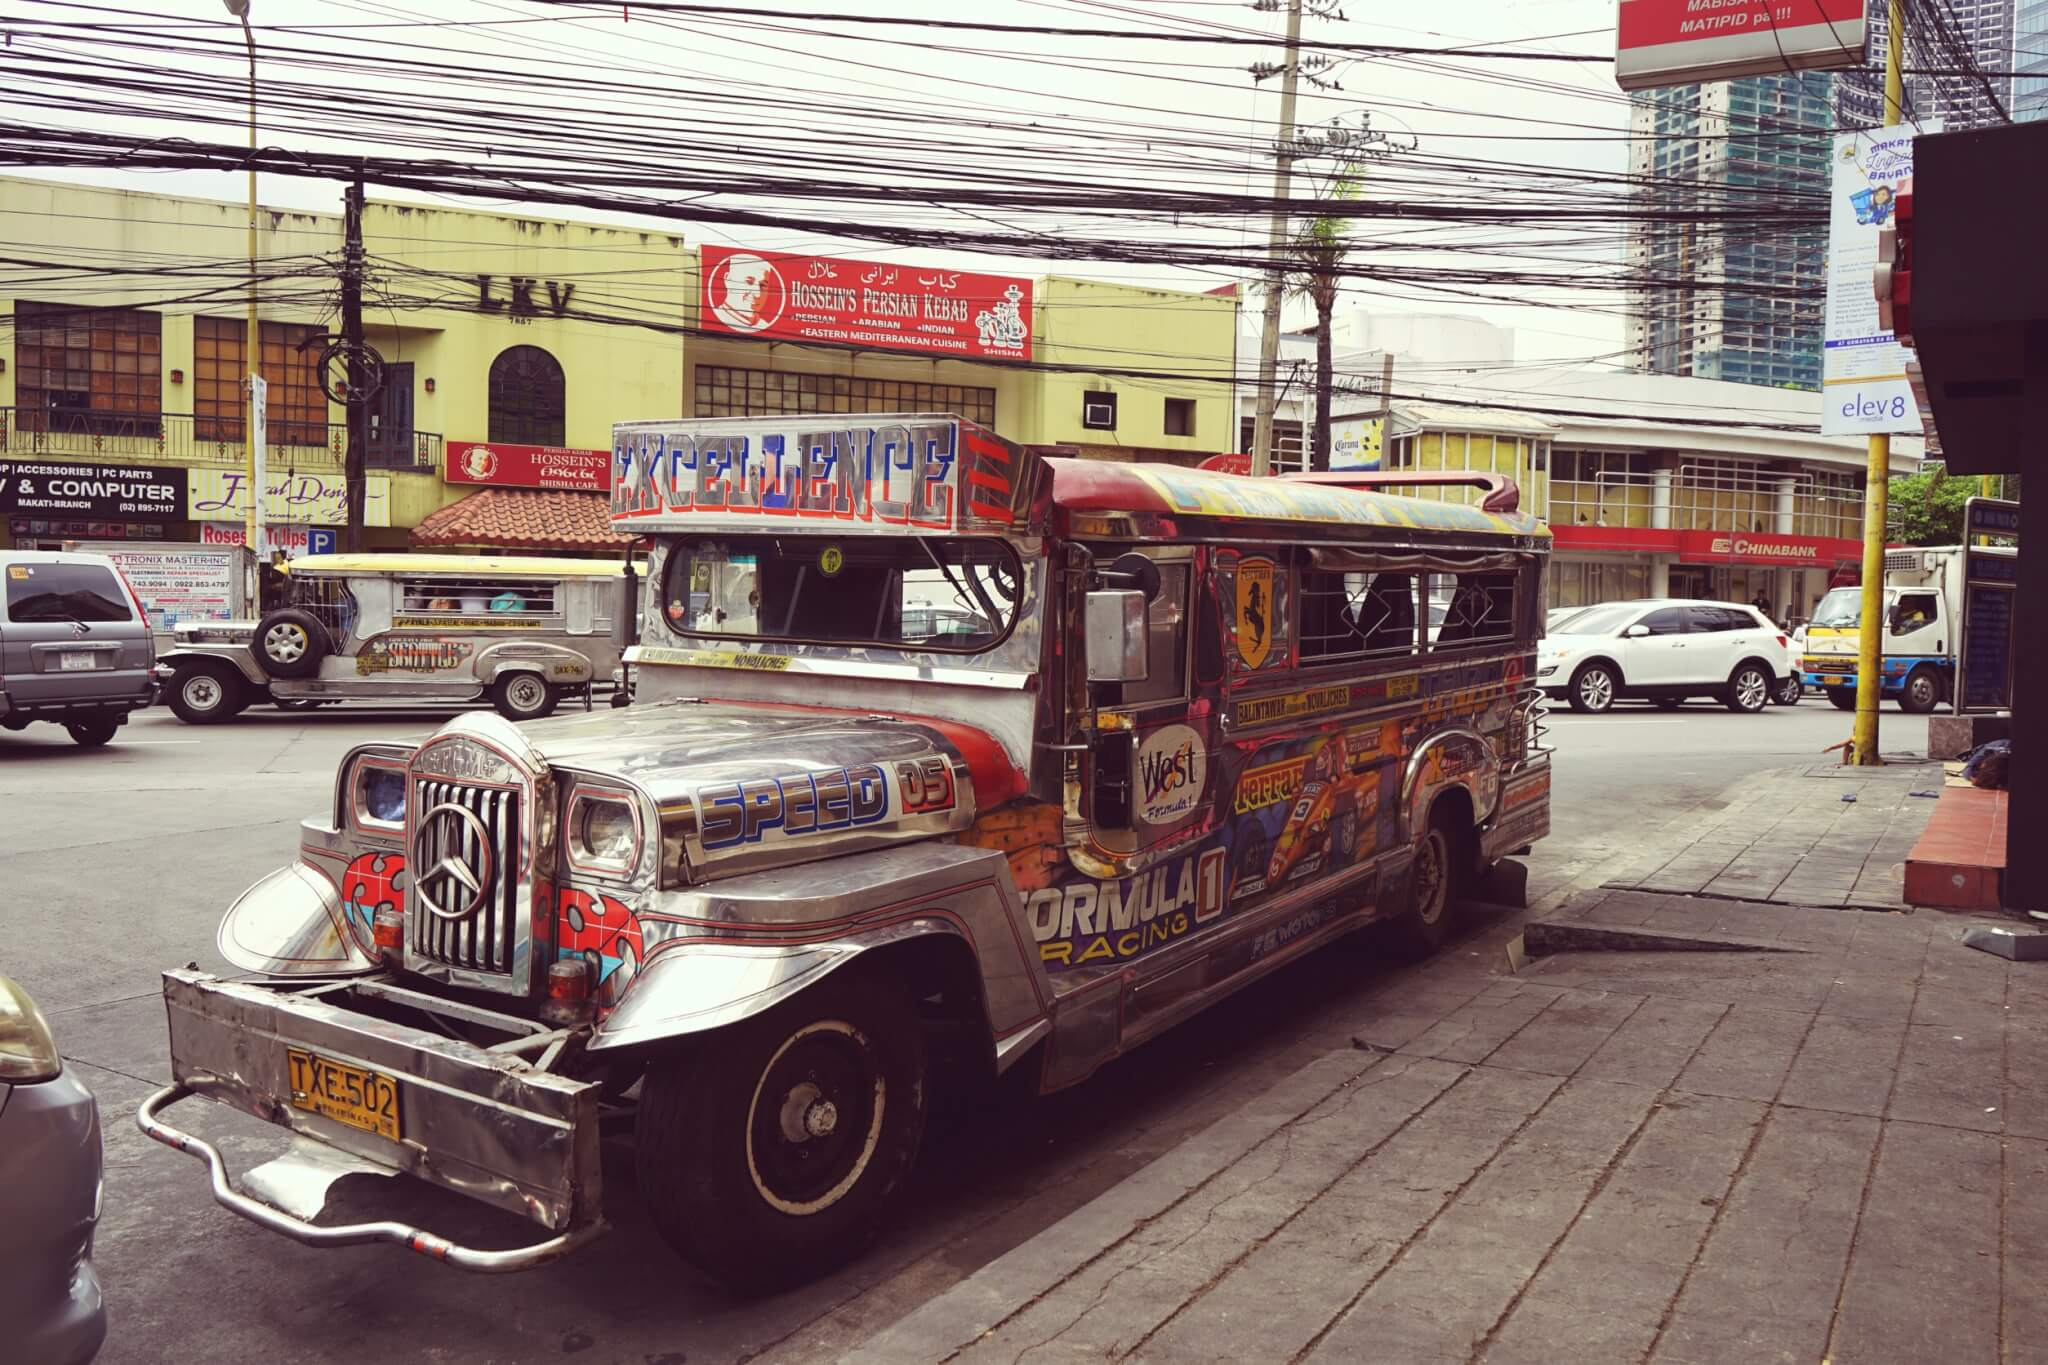 Metro Manila Kurz Vorm Kulturschock Wurde Alles Gut Witravel